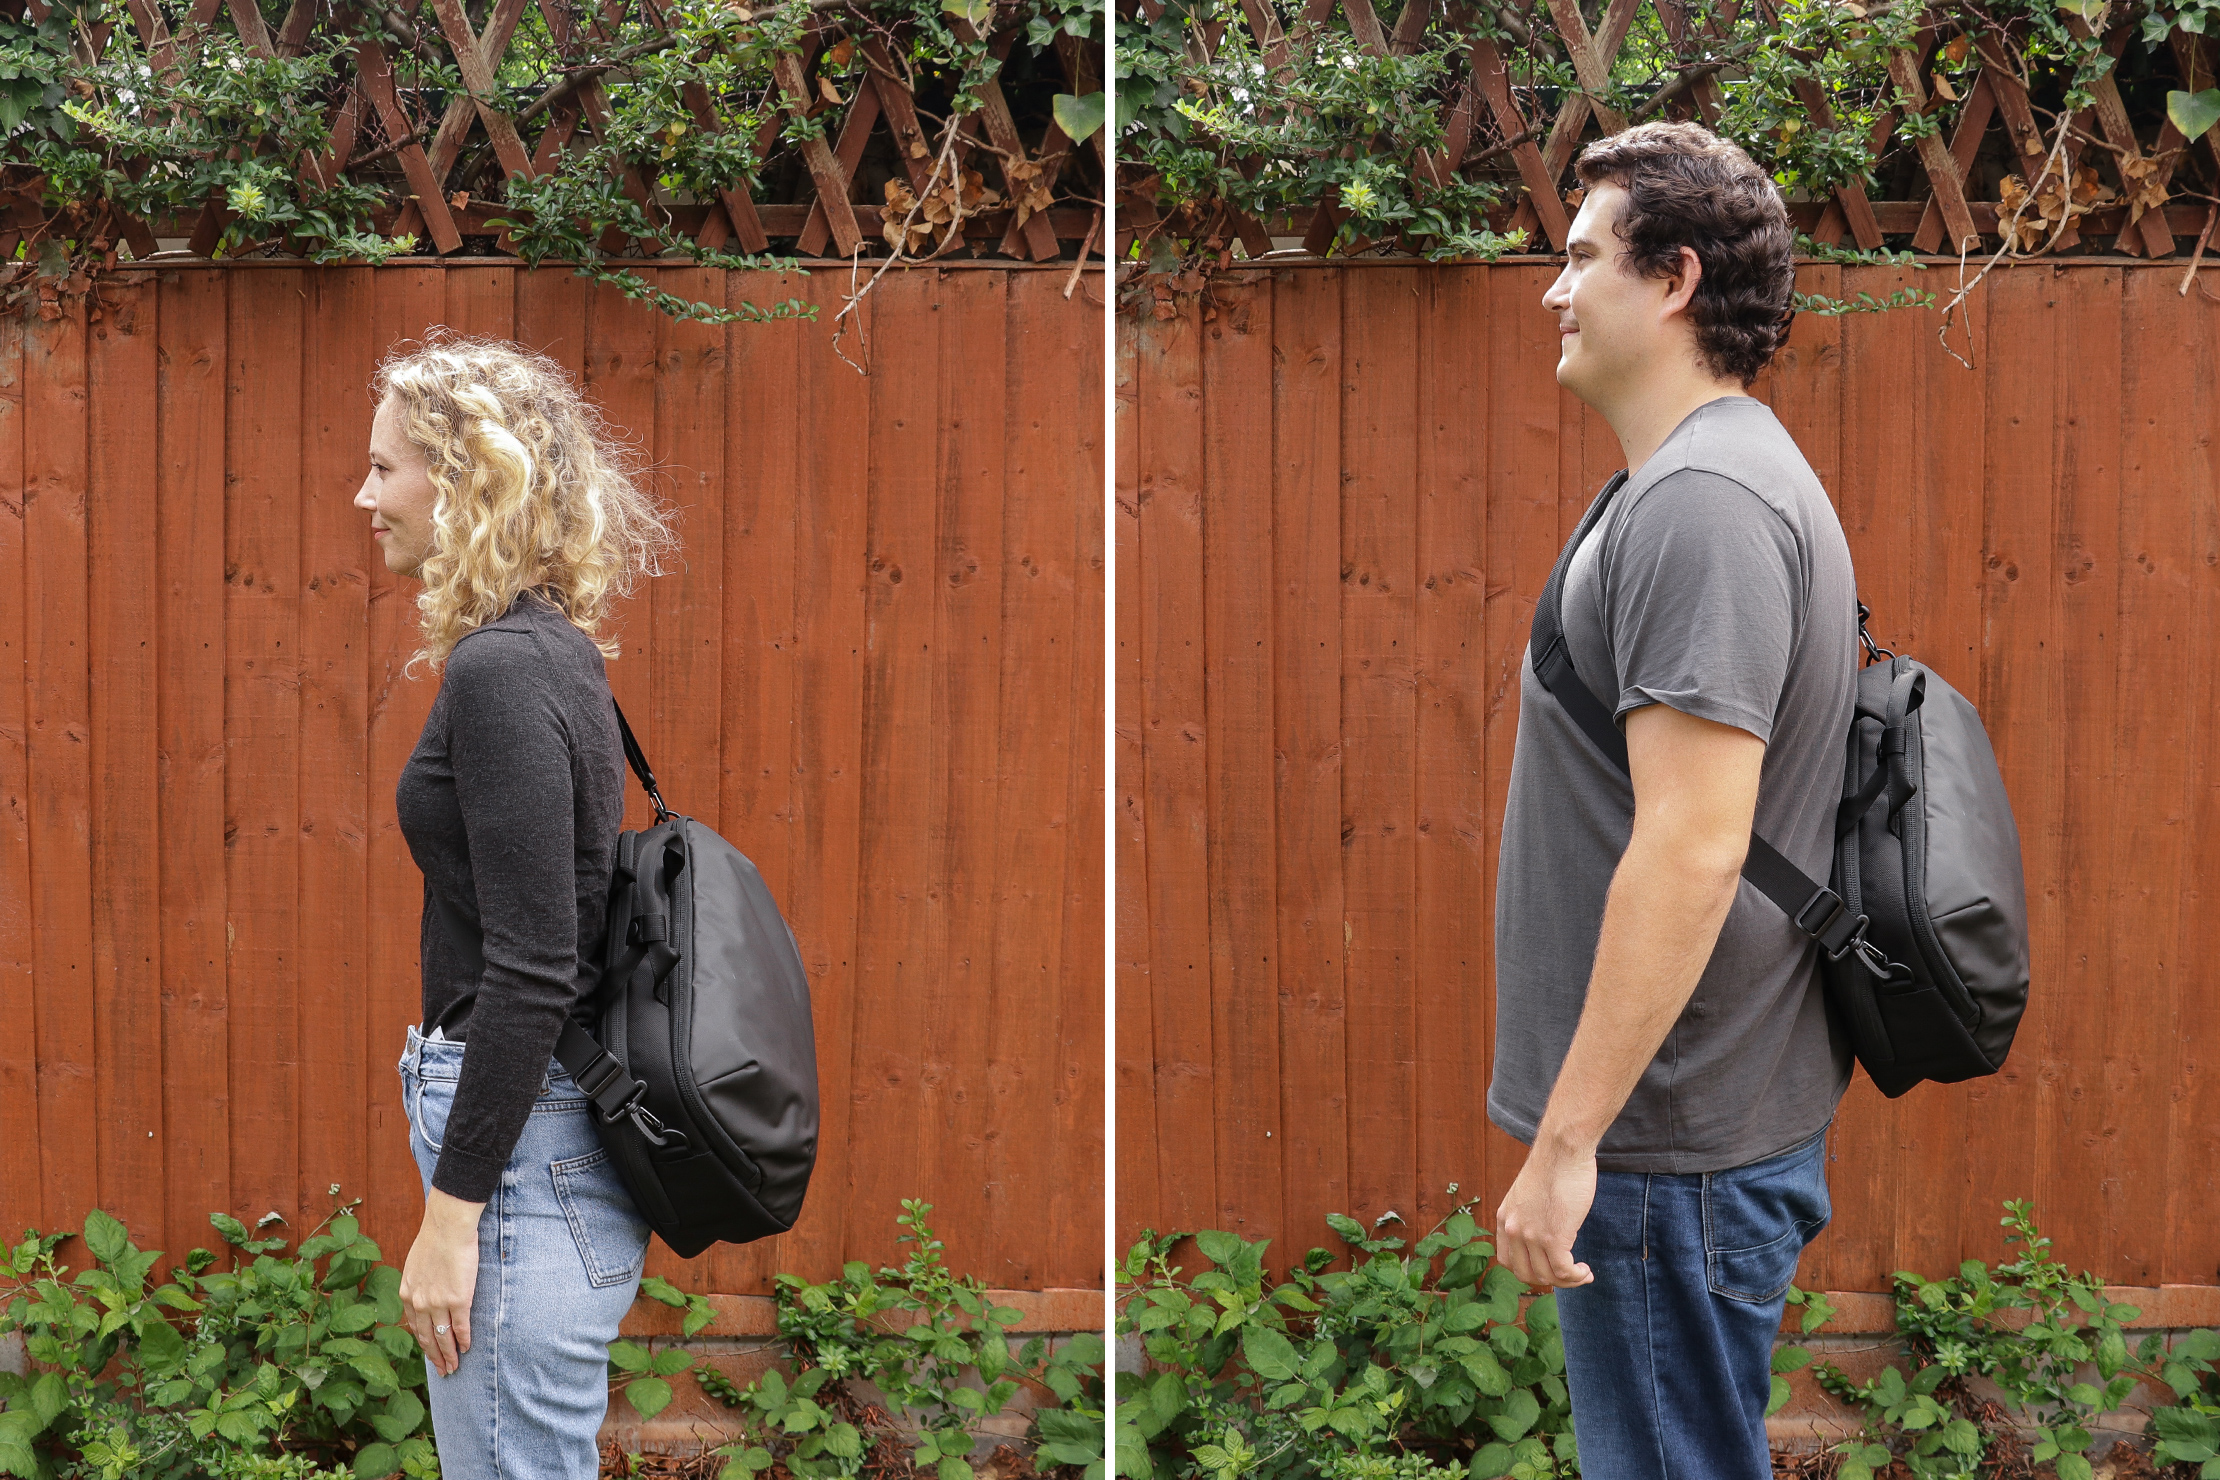 "Left: Rebecca, Height: 5'7"" (170 cm), Torso: 16 in (40 cm)   Right: Nathan, Height: 6'4"" (193 cm), Torso: 19"" (48 cm)"